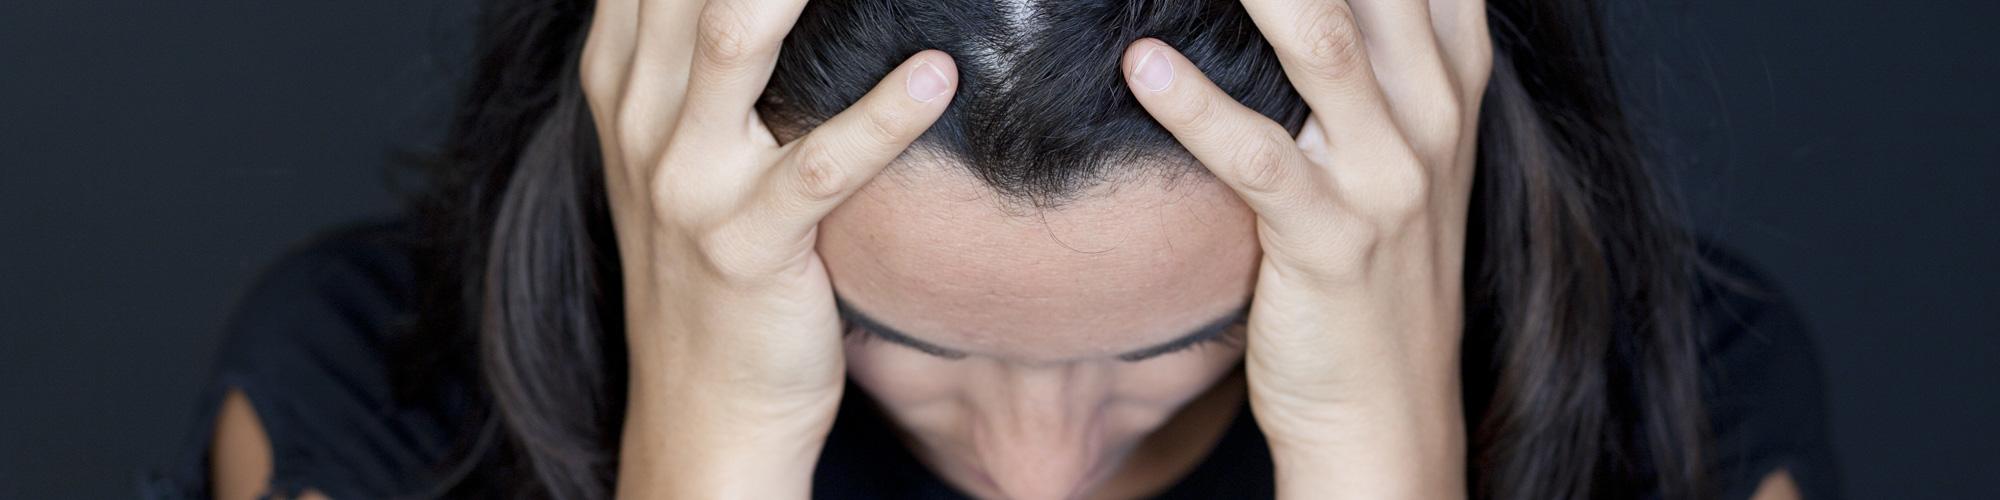 vivi-hinrichs-flerkulturel-psykoterapi-krise-sorg